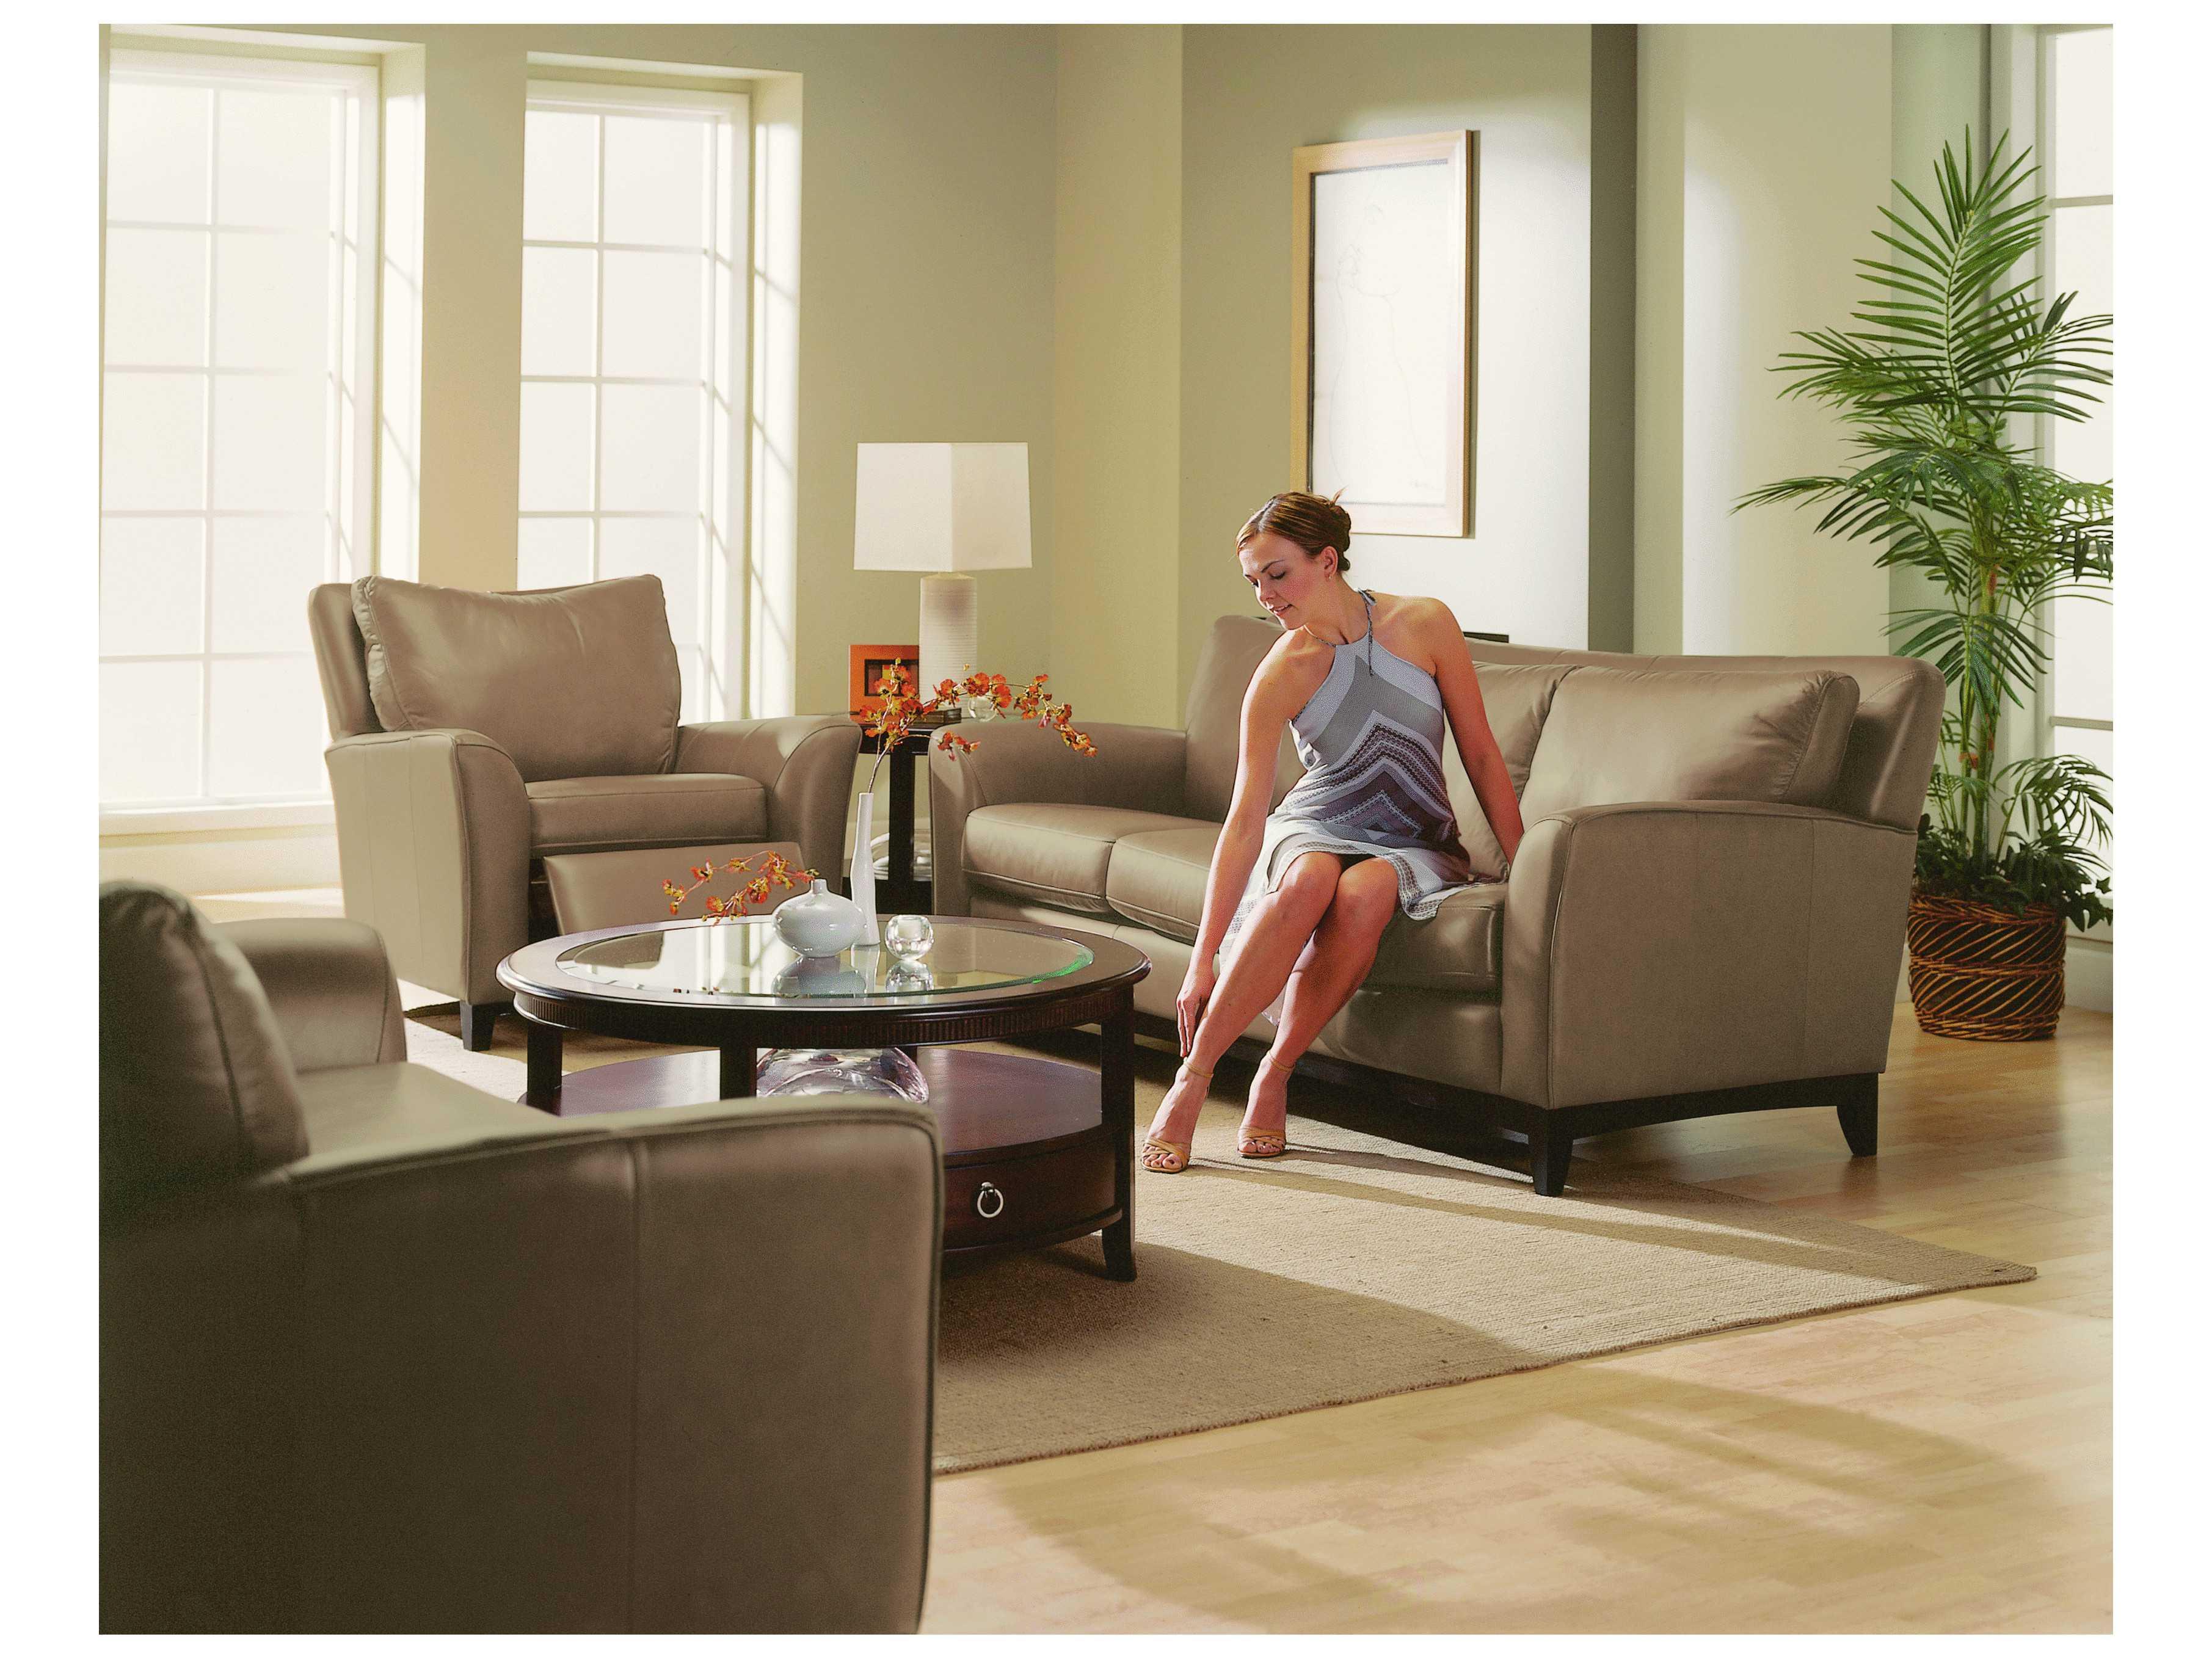 palliser india living room set pl77287st2